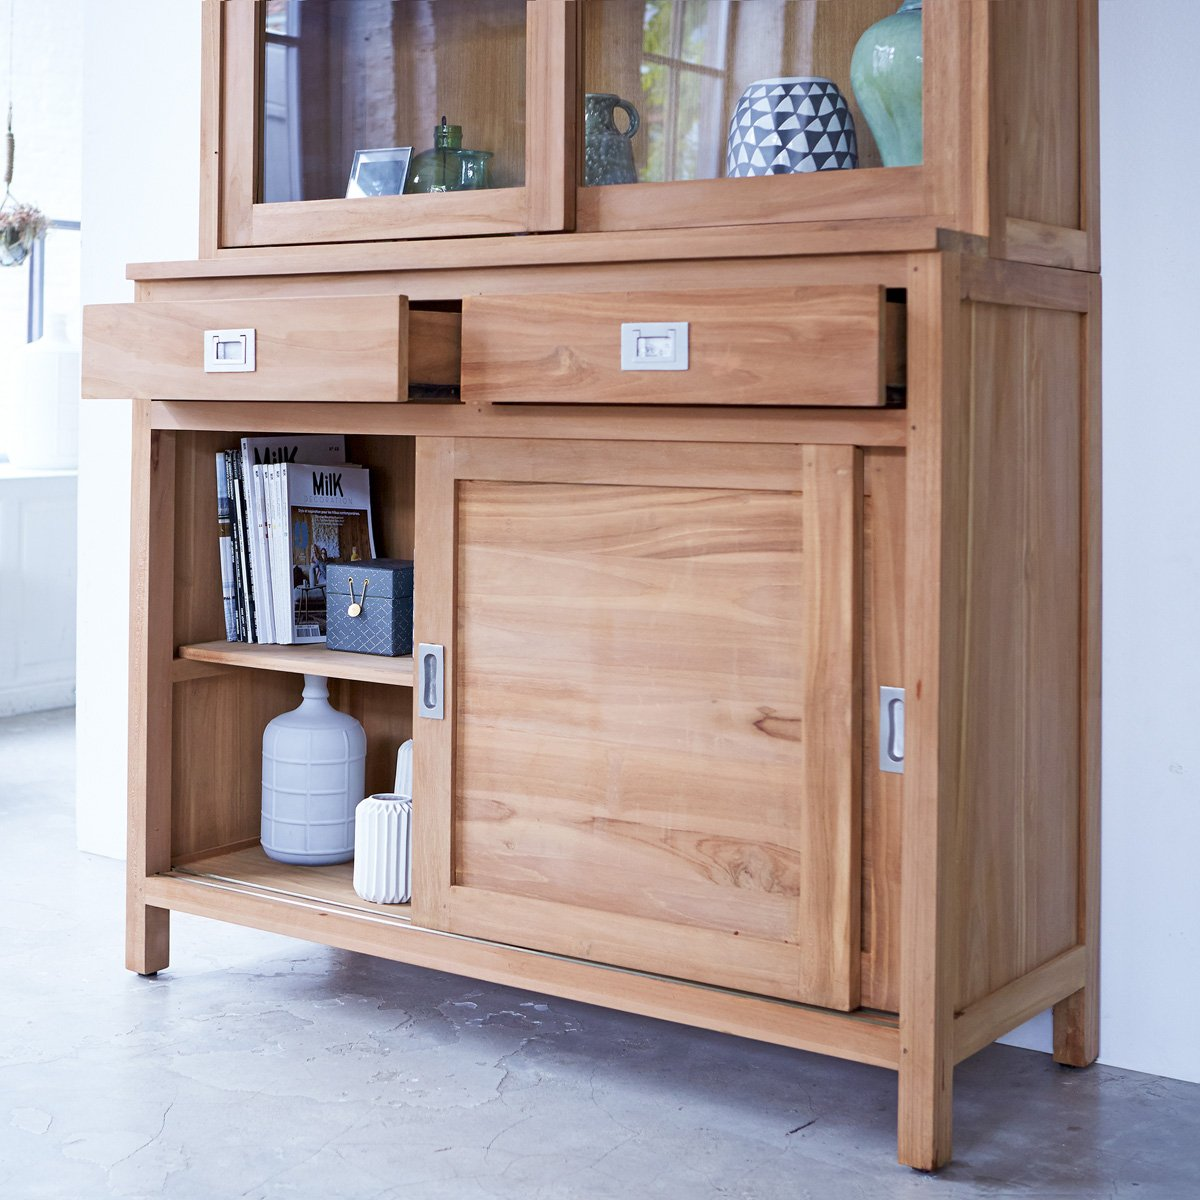 Solid Teak Wood Kitchen Dresser Dining Cabinet Sliding Doors Living Room Amazoncouk Home